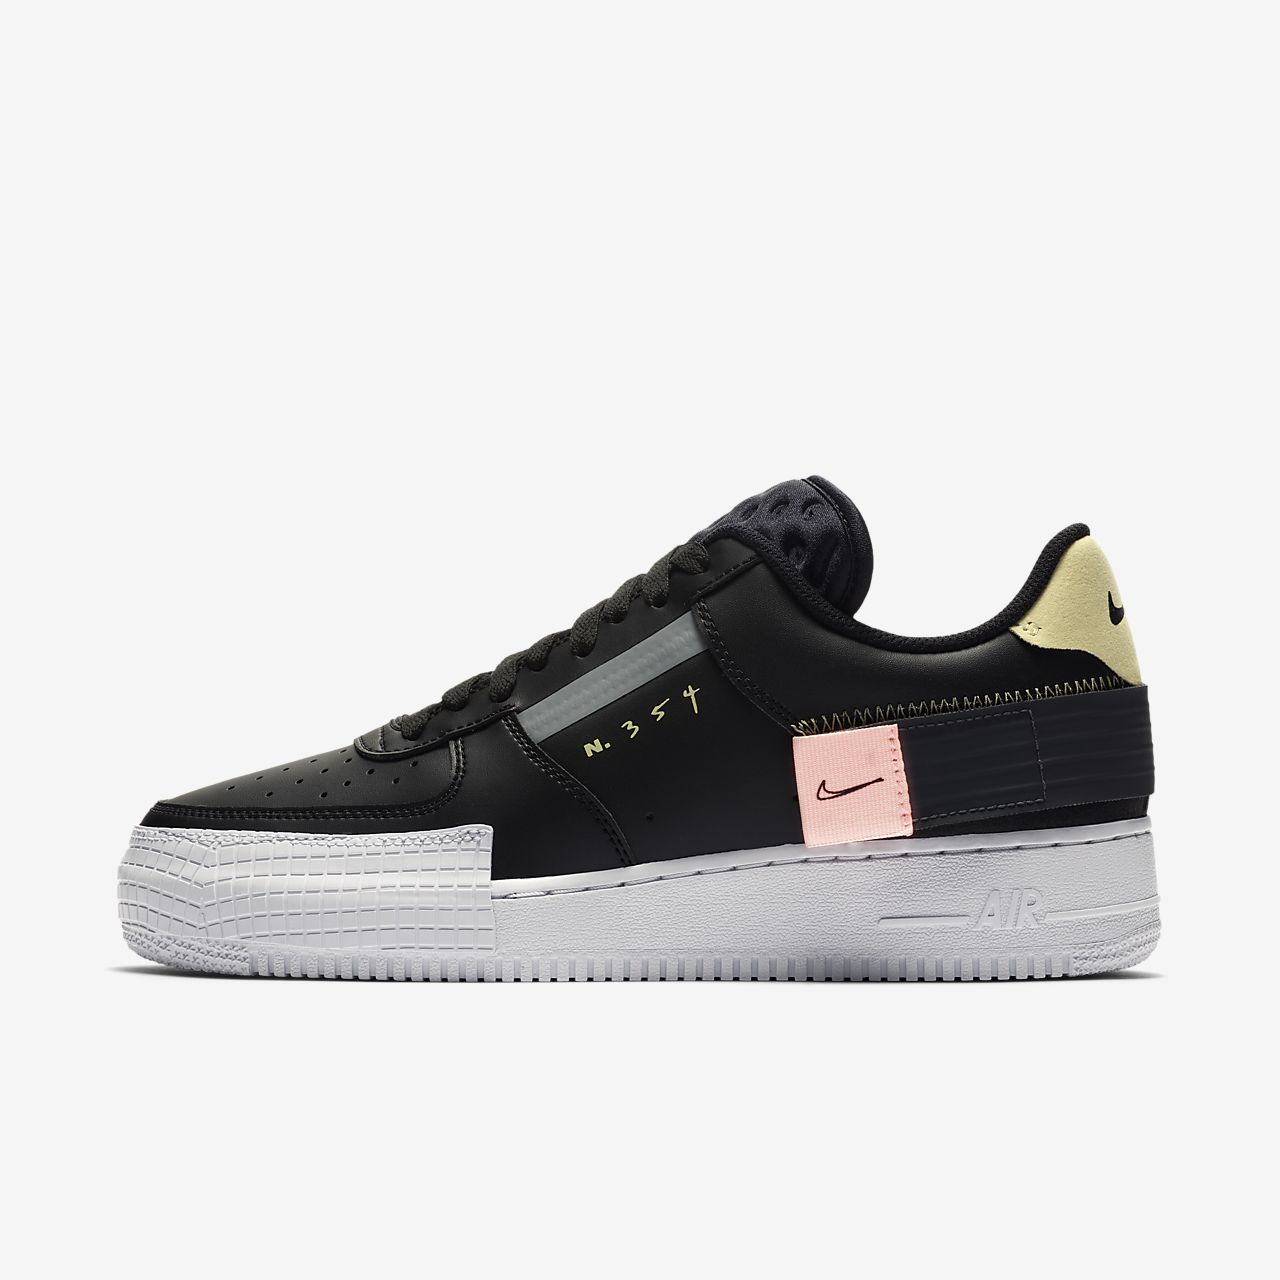 Buty Nike AF1 TYPE Black (CI0054 001) | Buty  Męskie